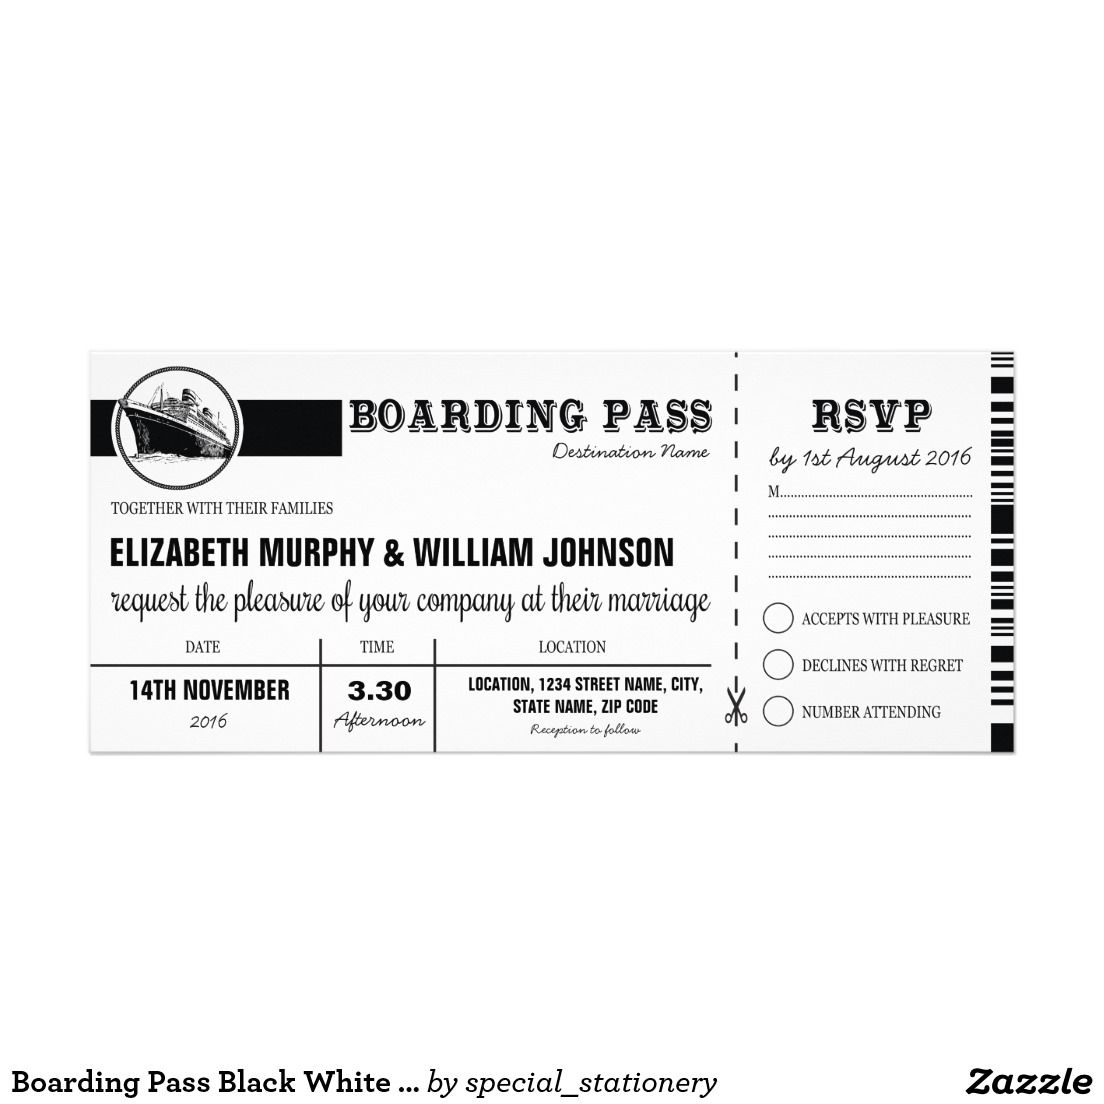 Boarding Pass Black White Vintage Cruise Wedding | Black and White ...